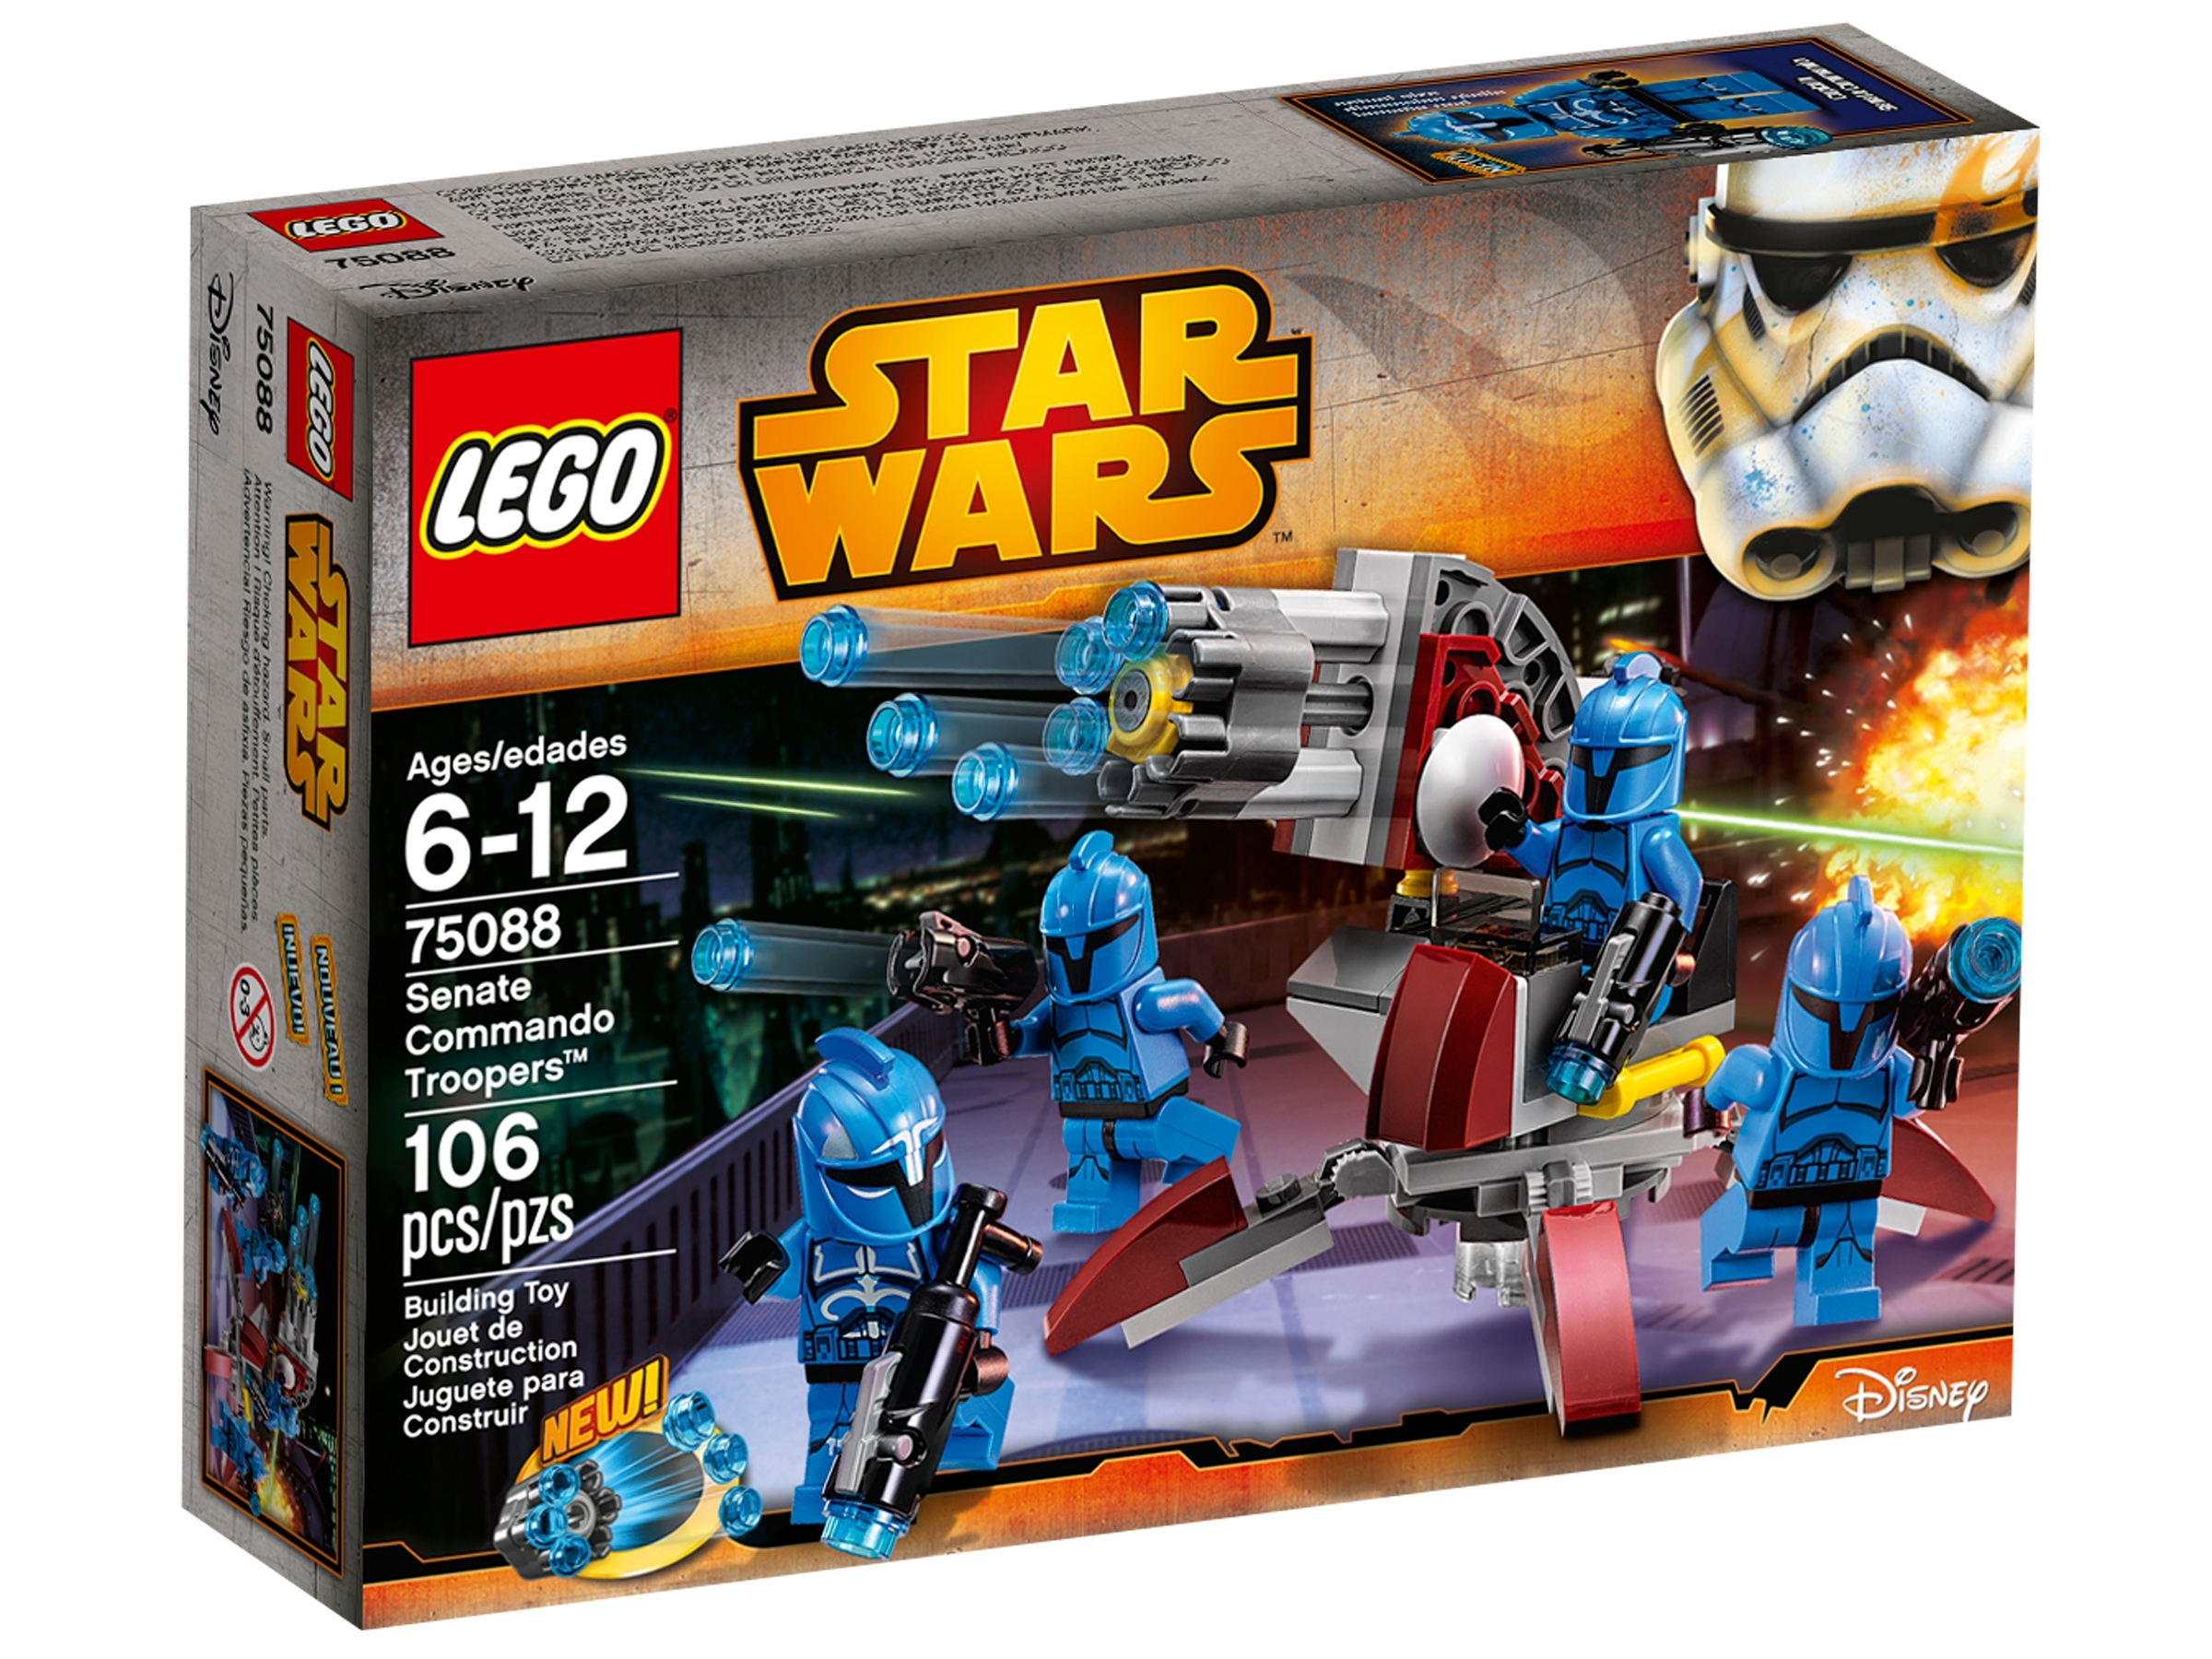 Lego Minifigure Star Wars SW0288 Senate Commando Captain 8128